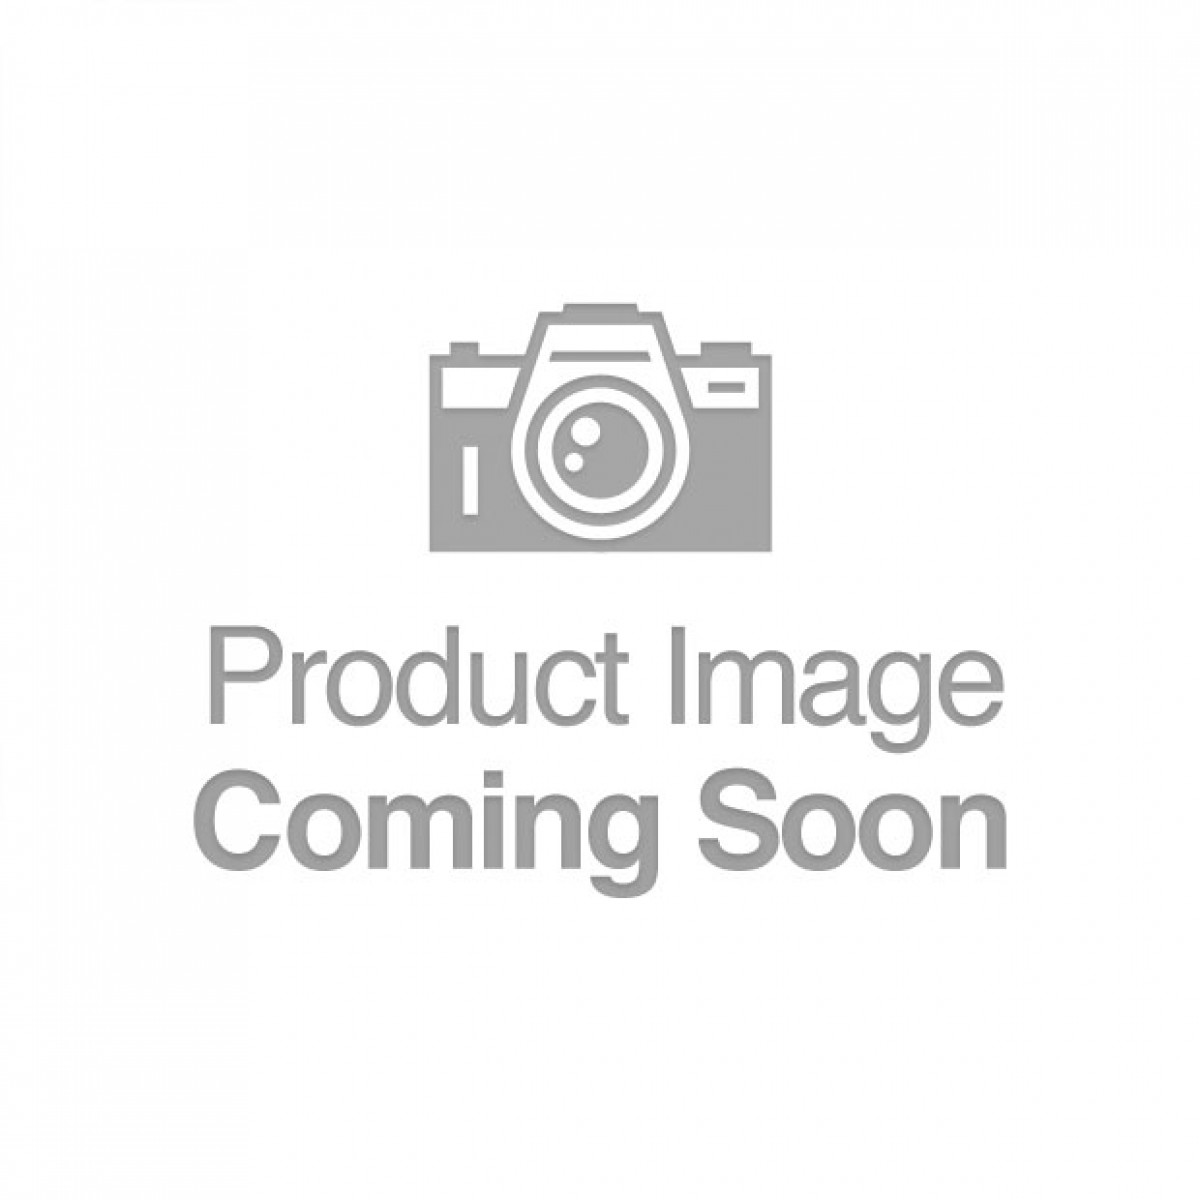 Cocksicle Fizzin 10x Silicone Rechargeable Vibrator - Magenta